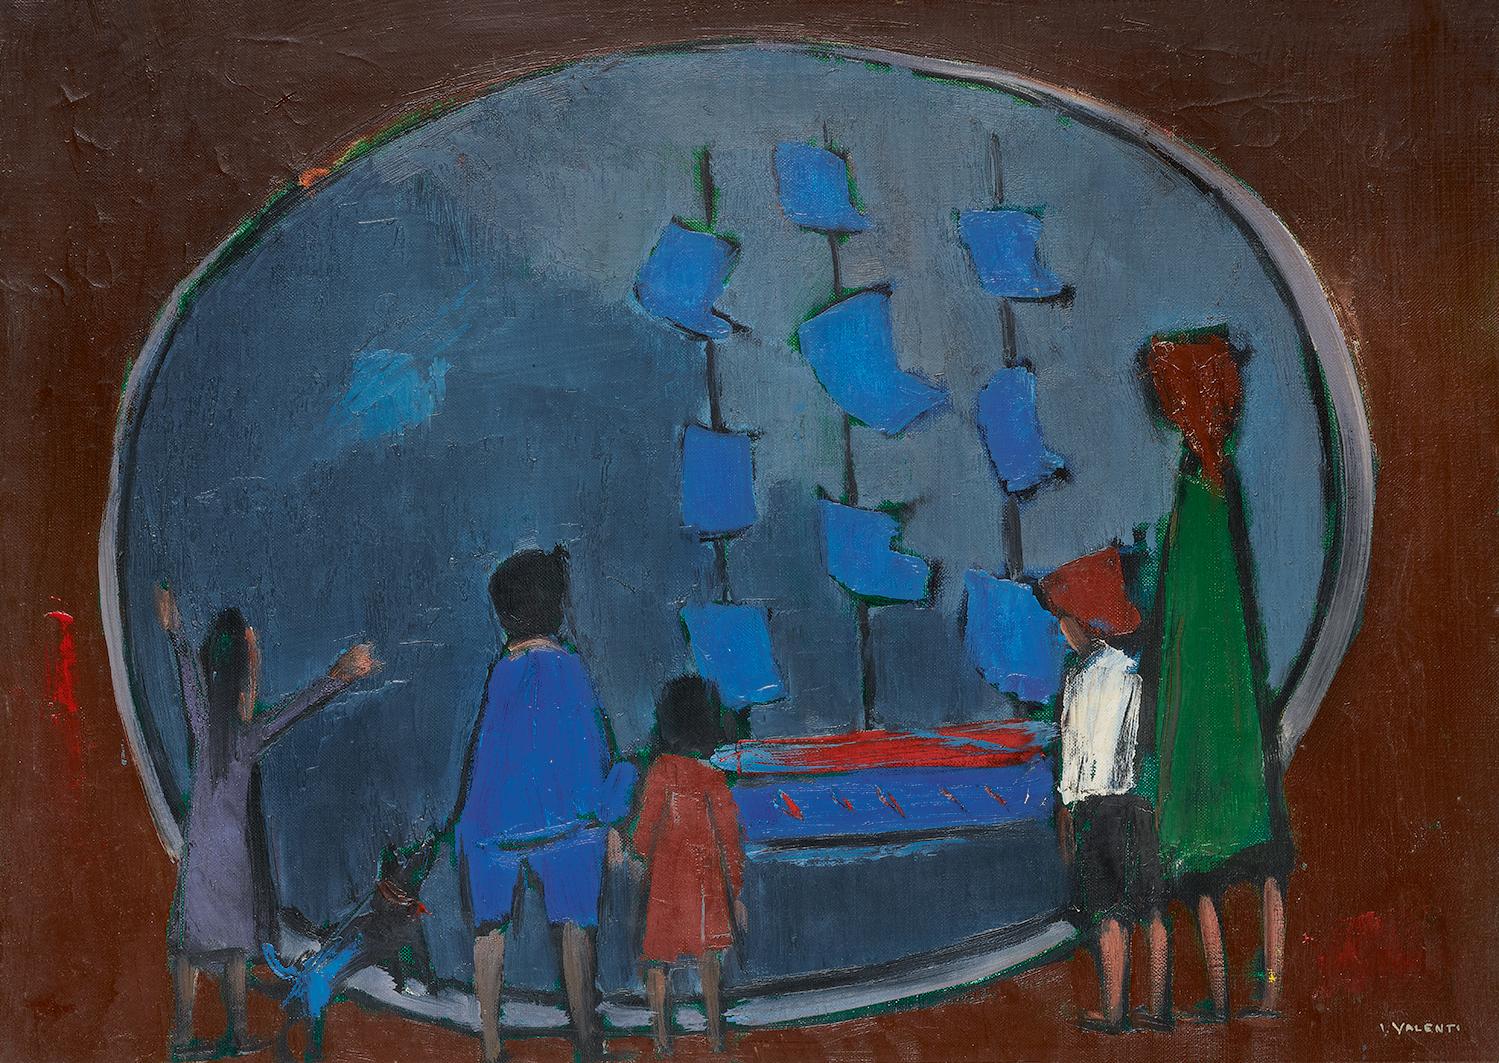 Valenti Italo, La vasca dei bambini